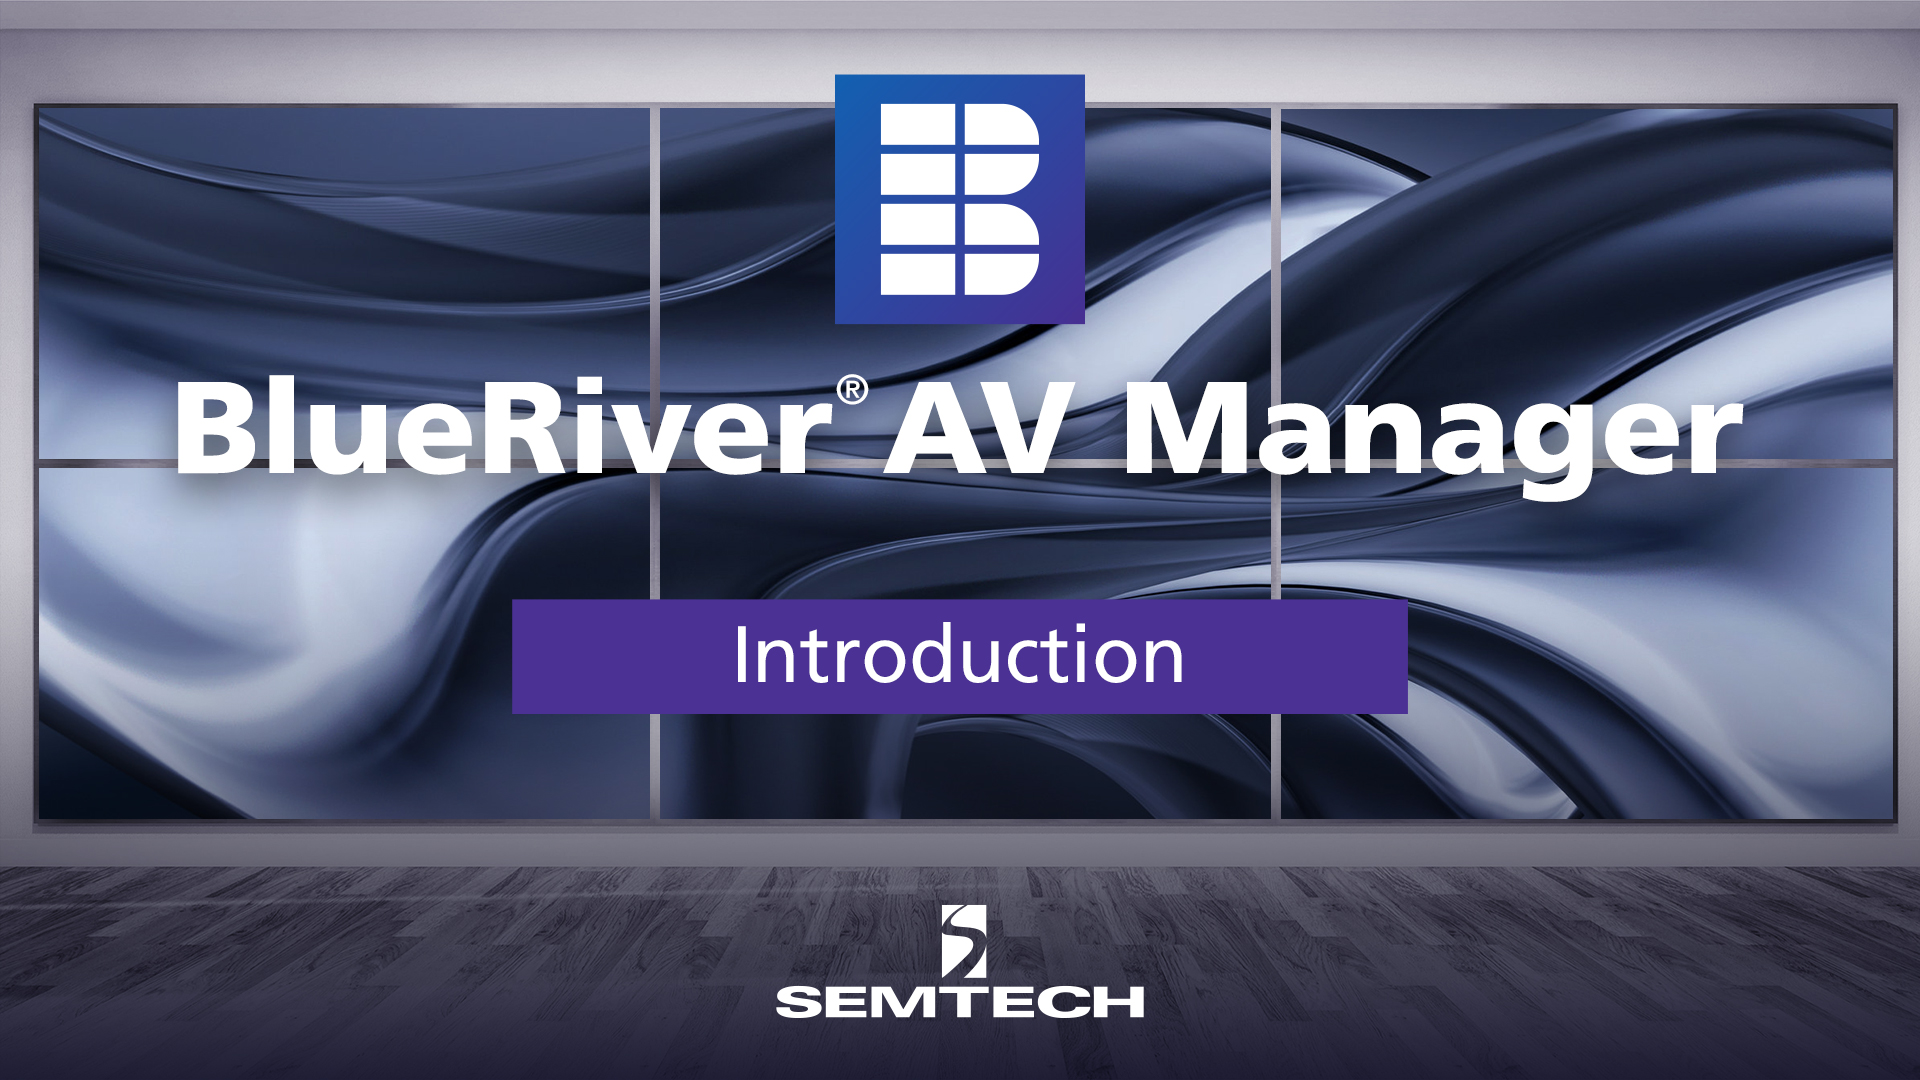 BlueRiver AV Manager Software Introduction Video